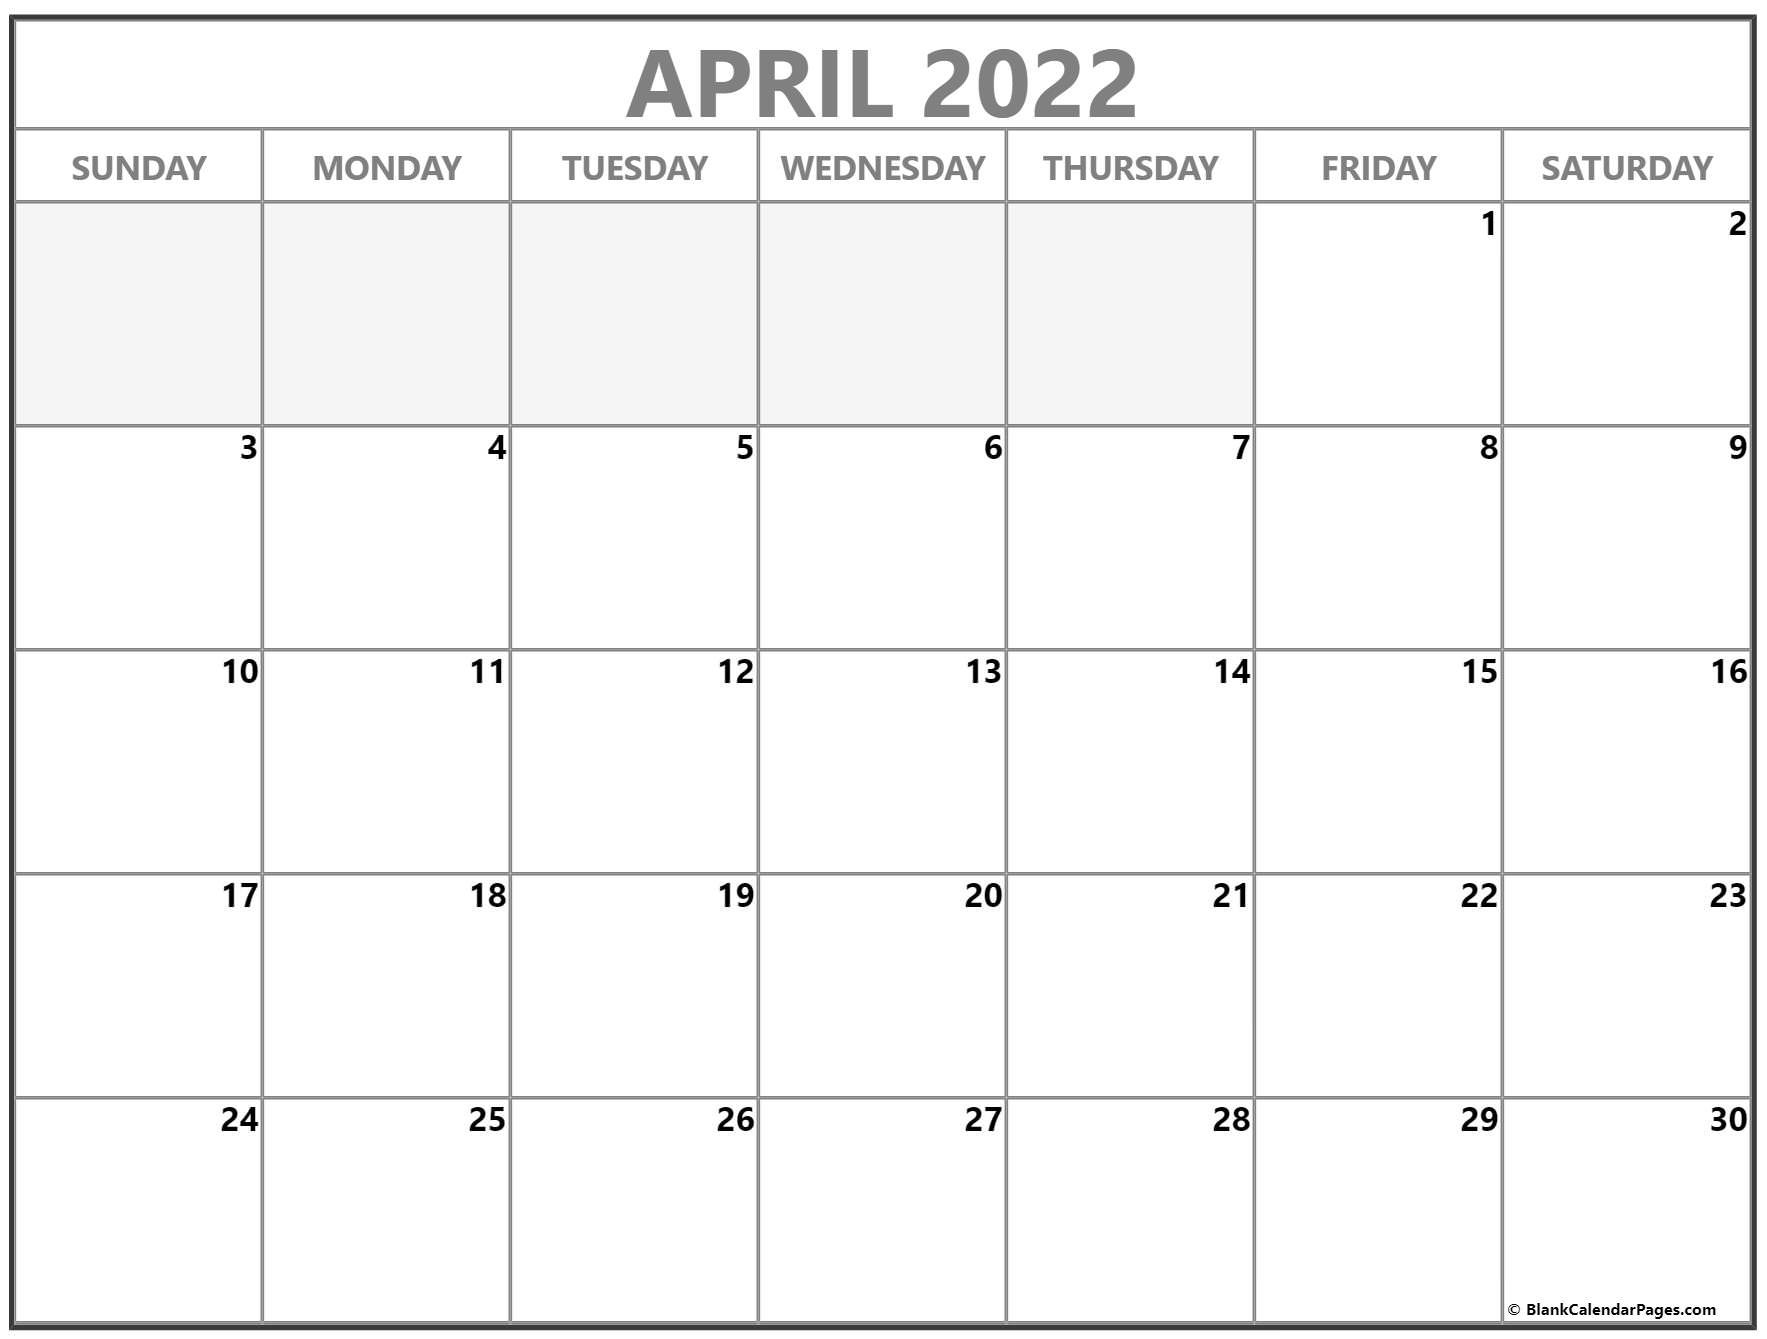 April 2022 Calendar   Free Printable Calendar Templates inside April 2022 Printable Calendar Free 2022